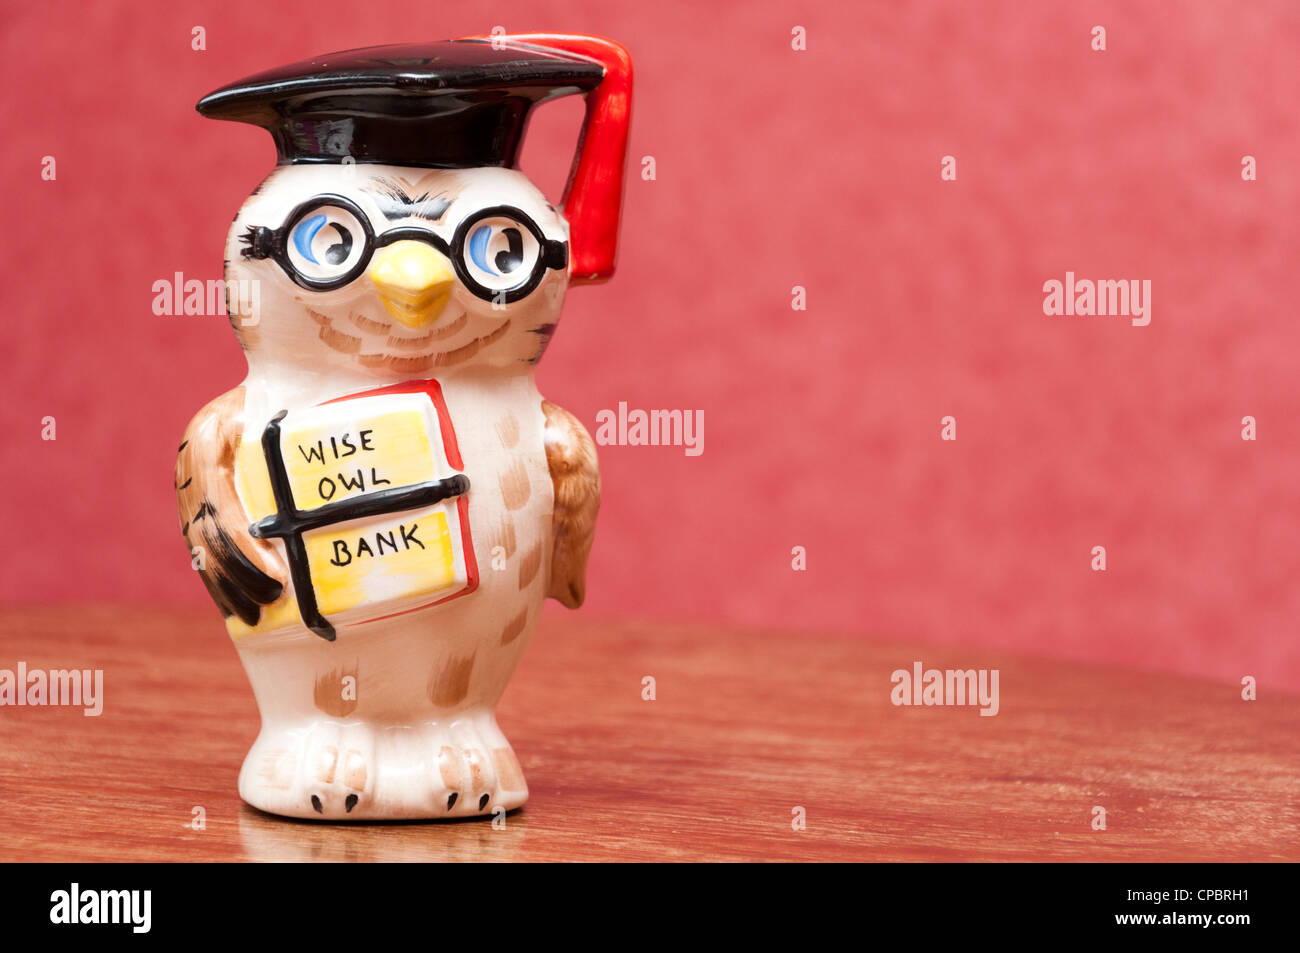 Wise owl money savings bank. - Stock Image